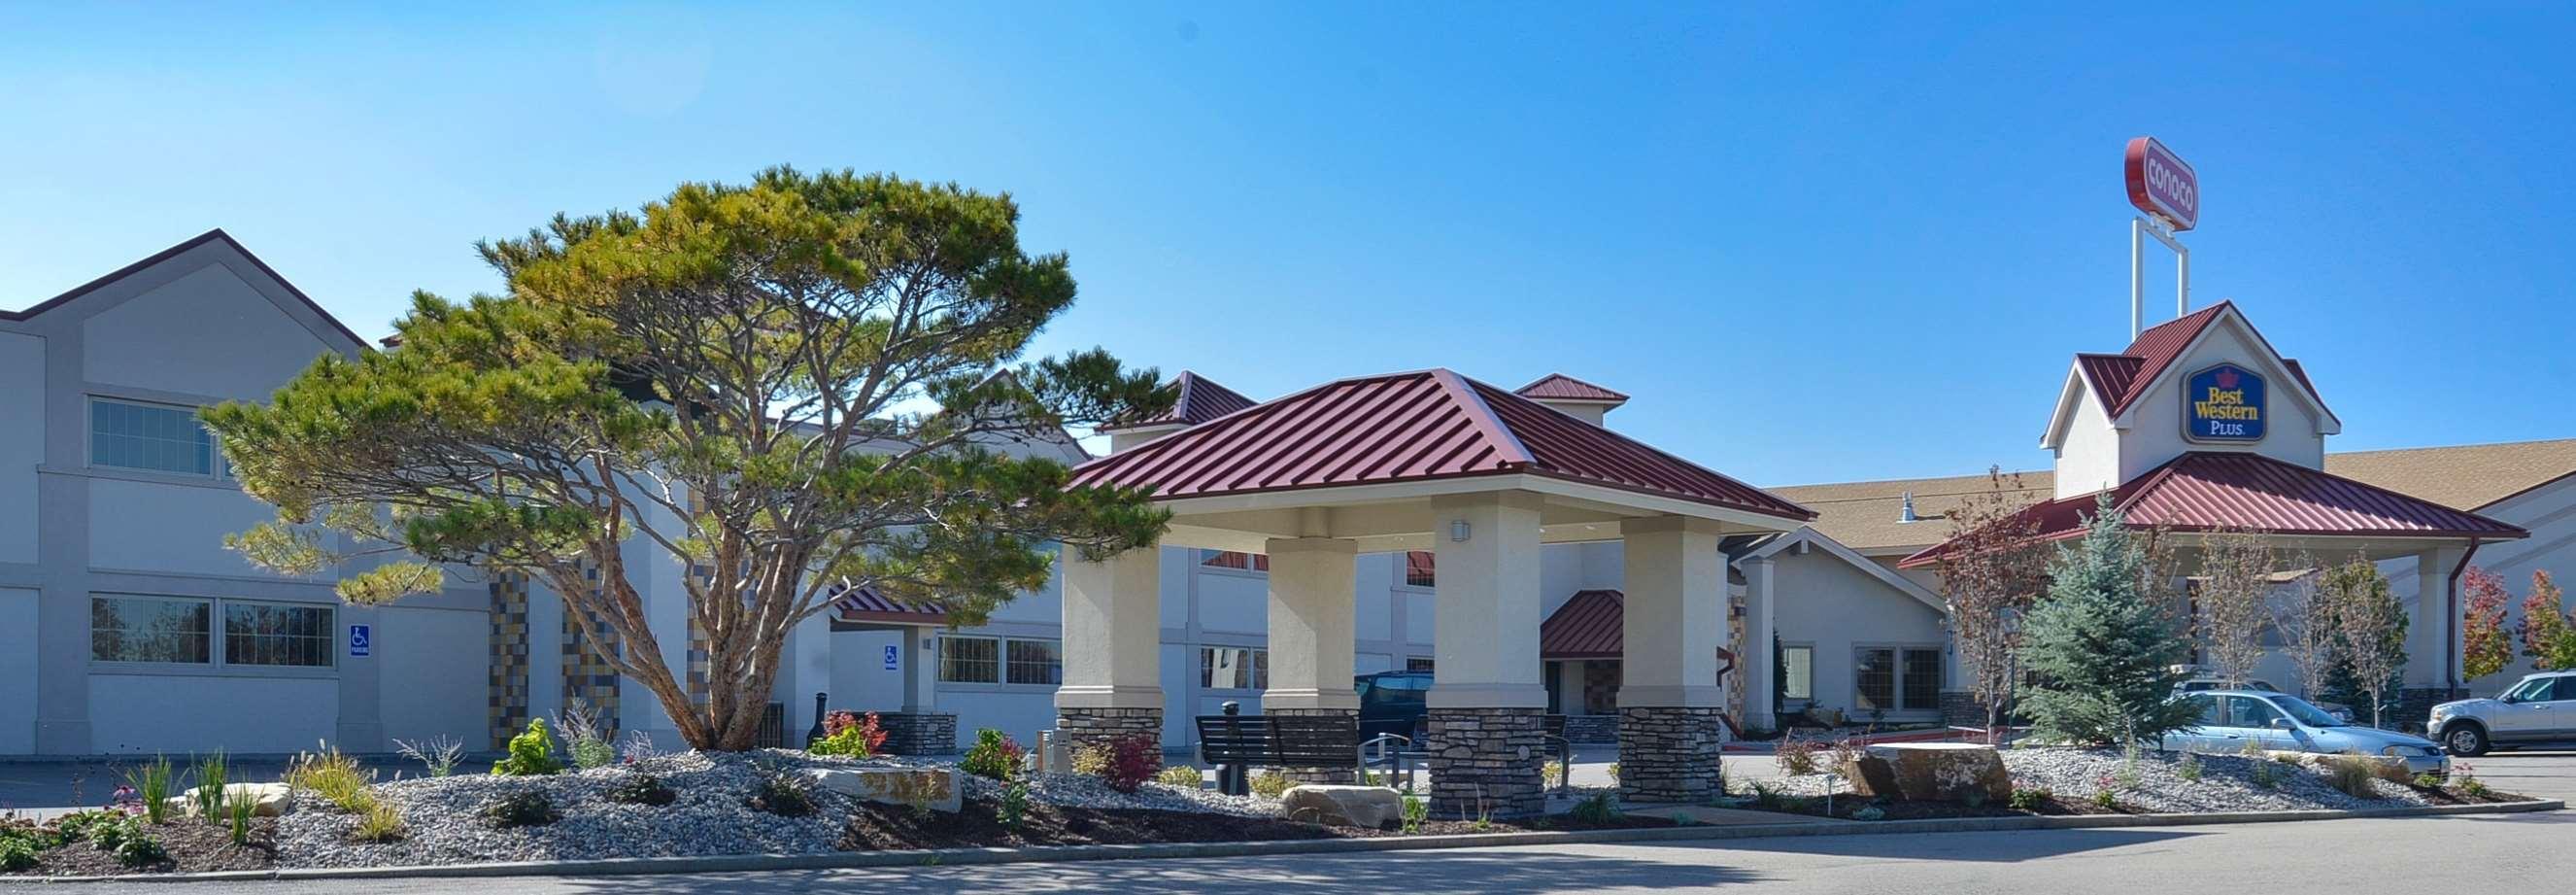 Best Western Plus Crossroads Inn & Conference Center in ...